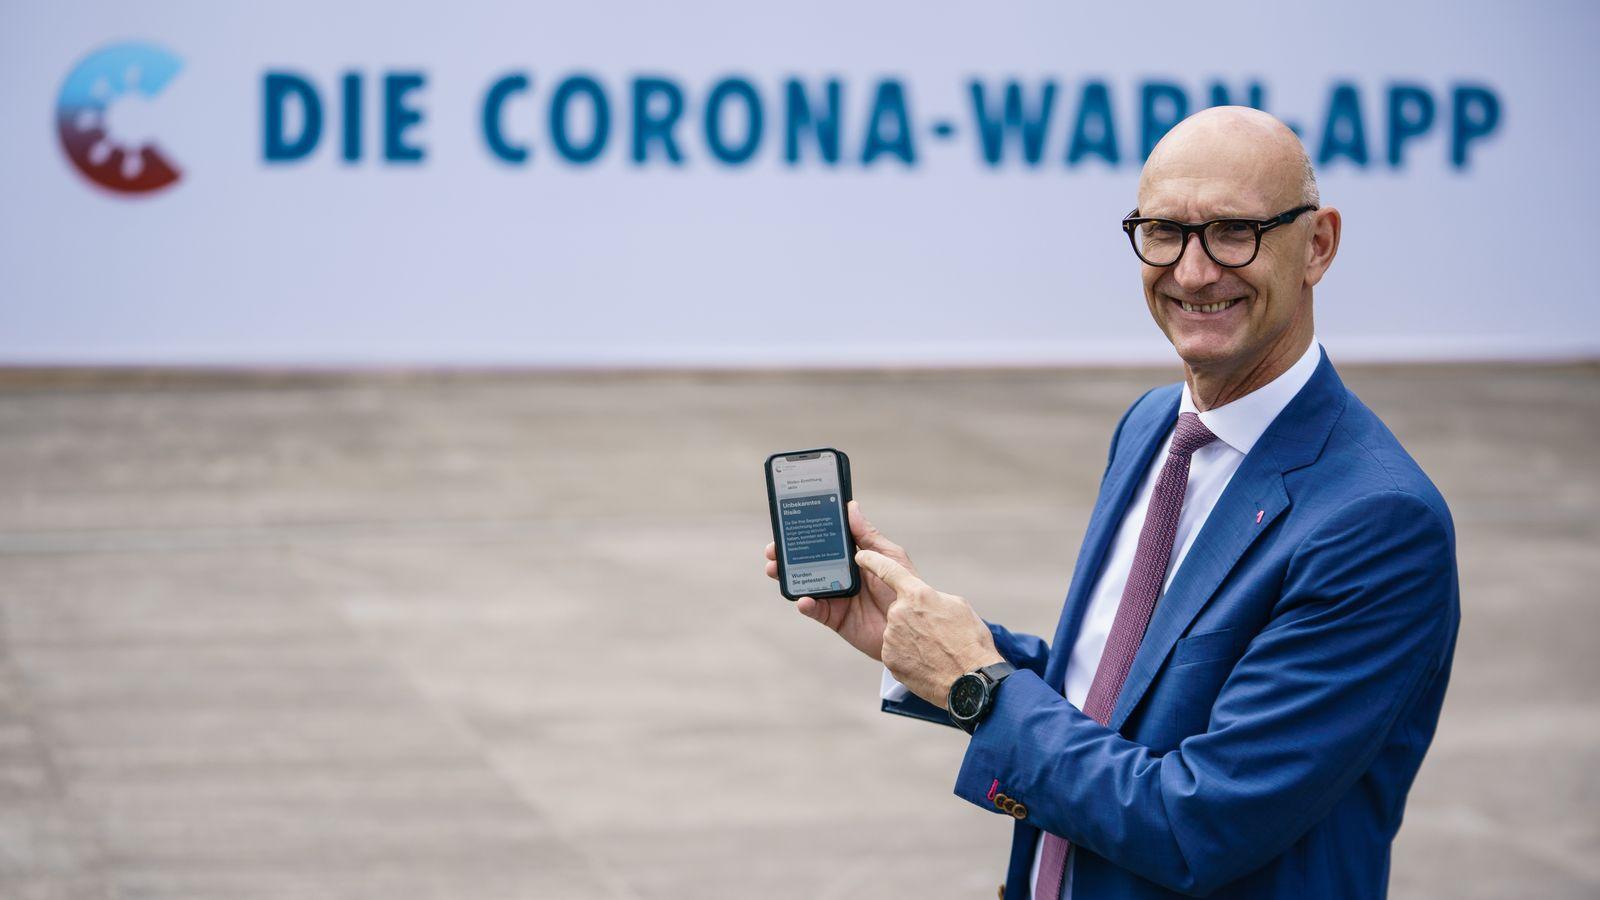 Presentation of German corona warning app, Berlin, Germany - 16 Jun 2020